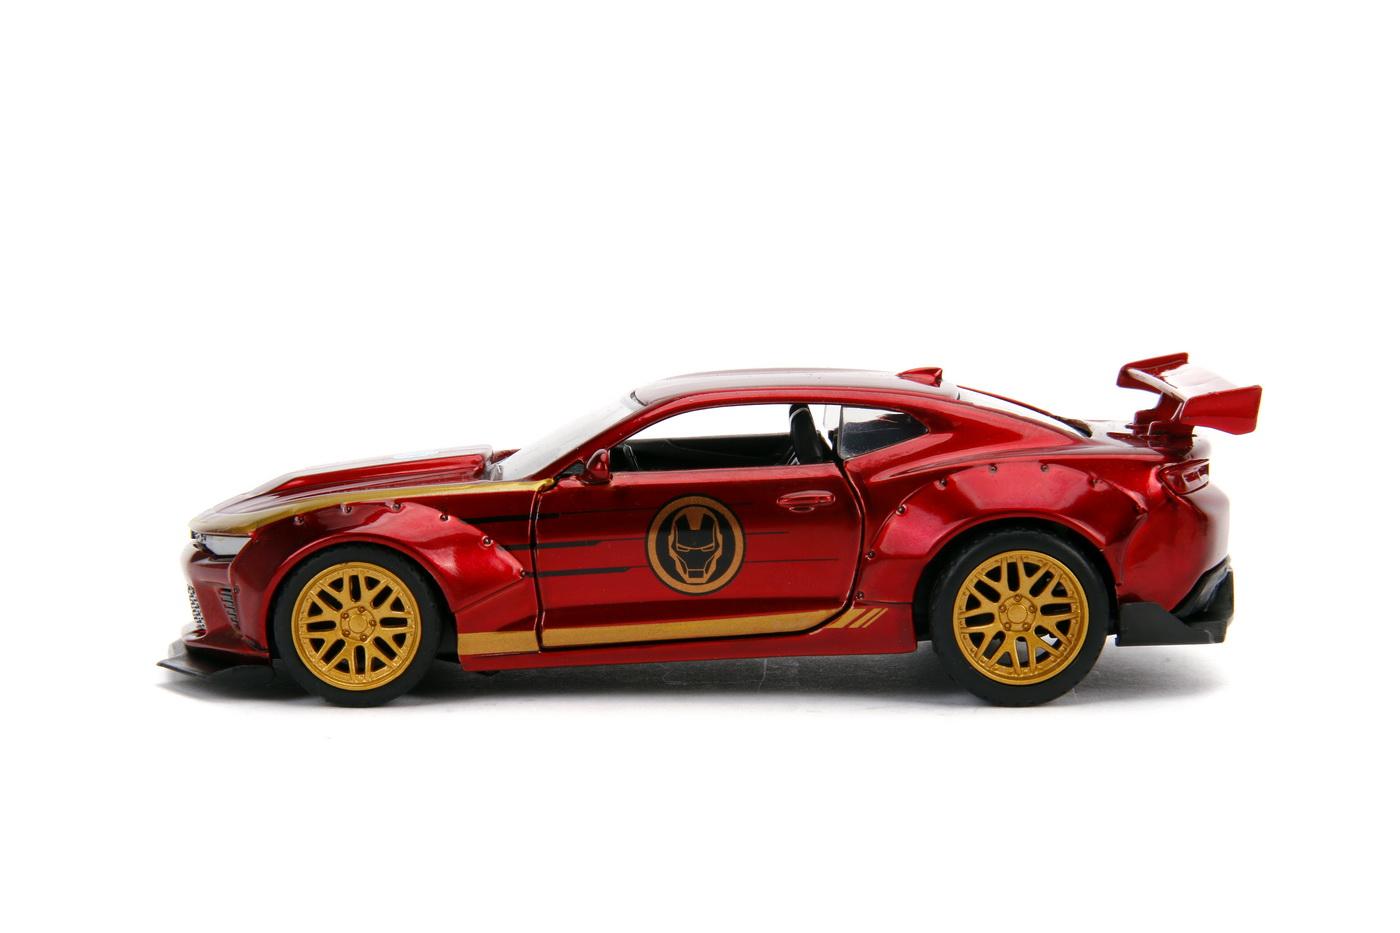 Masinuta Metalica Iron Man 2016 Chevy Camaro Ss Scara 1 La 32 | JadaToys - 6